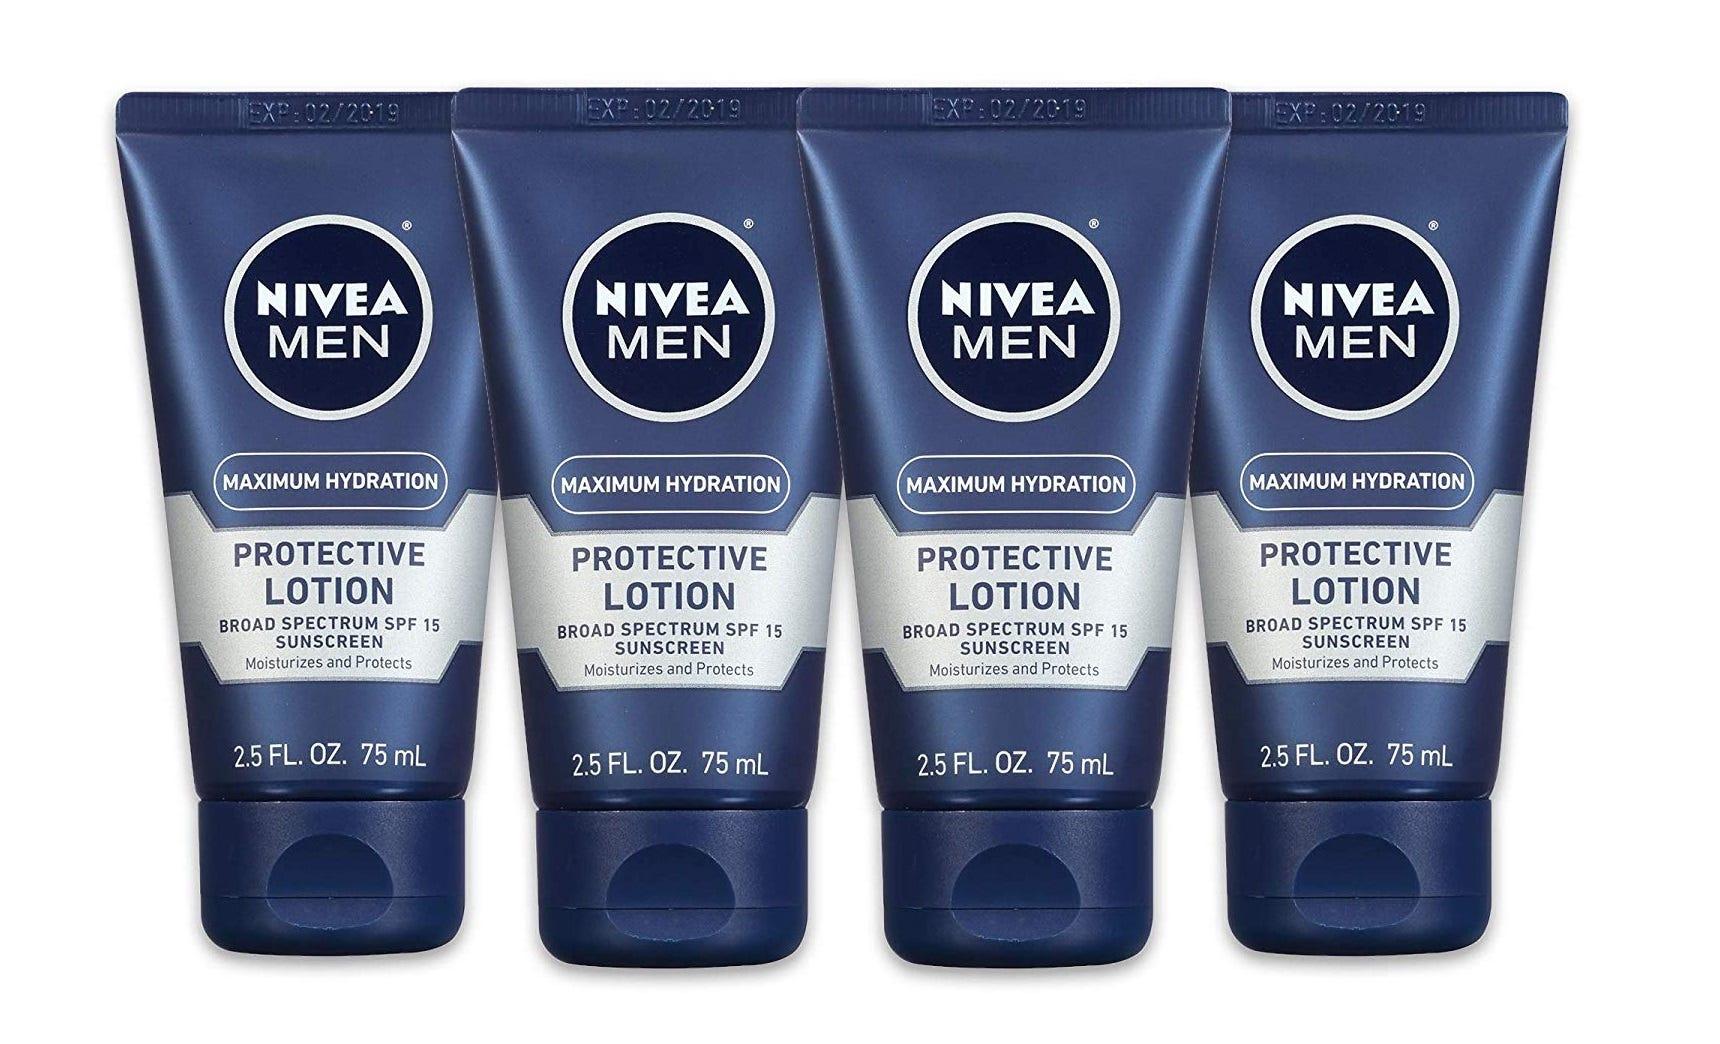 NIVEA Men Protective Lotion